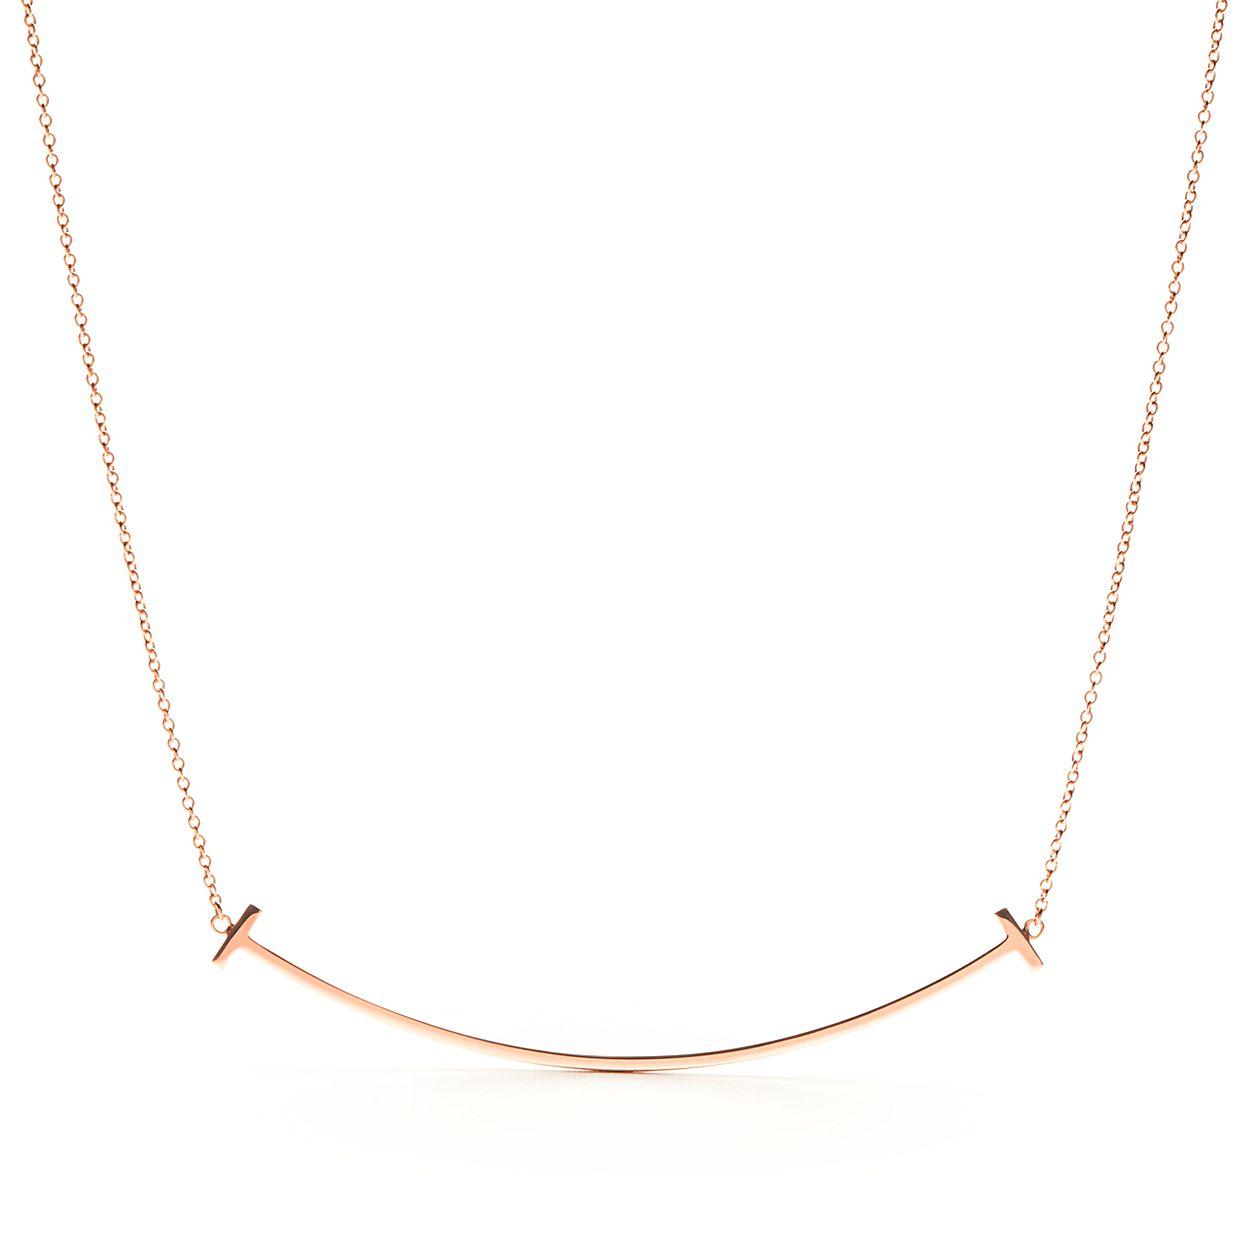 Sourire Boucles D'oreilles Tiffany T En Or Rose 18 Carats Avec Diamants Tiffany & Co. nW16fa8o